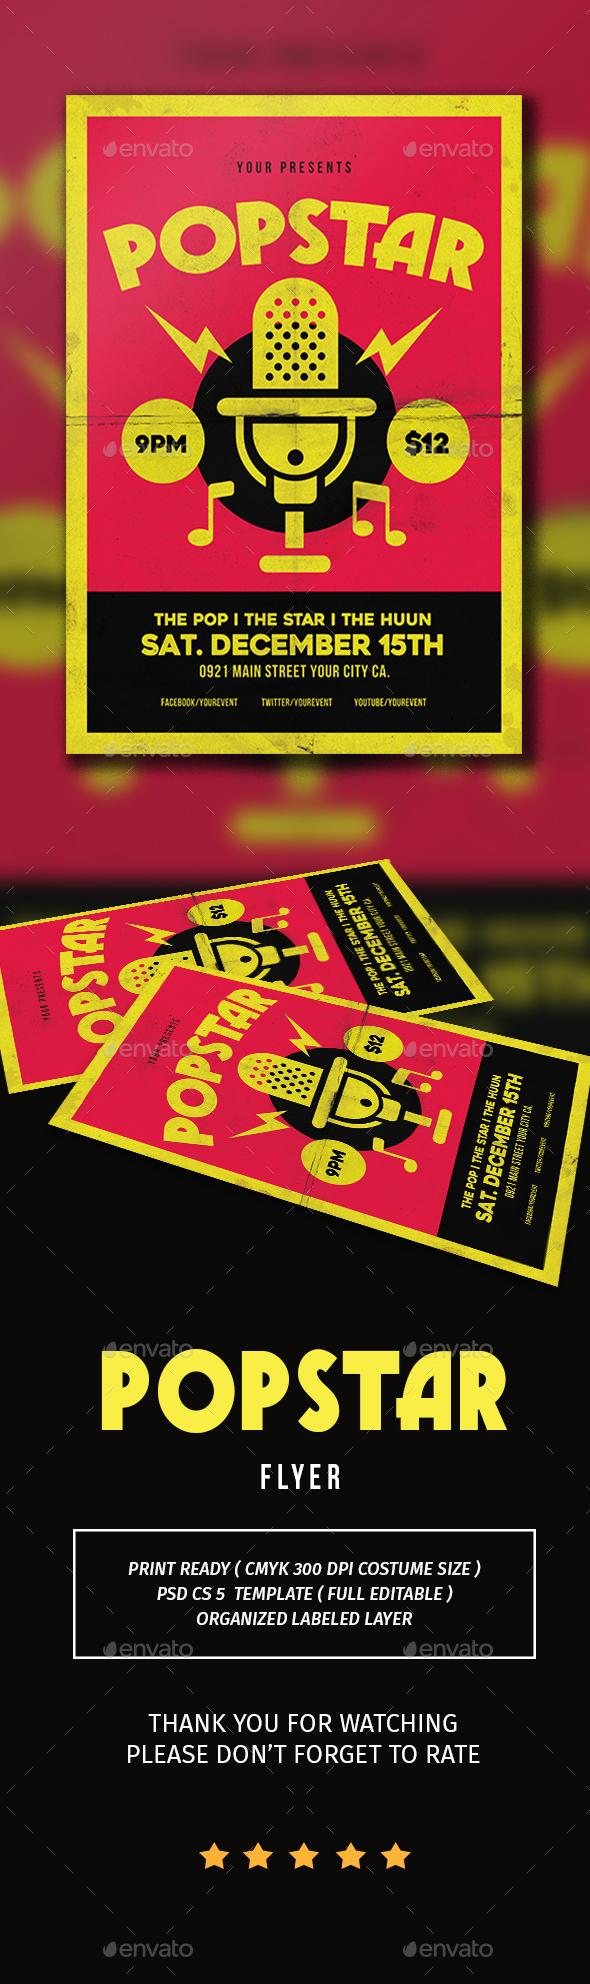 Popstar music flyer - Flyers Print Templates